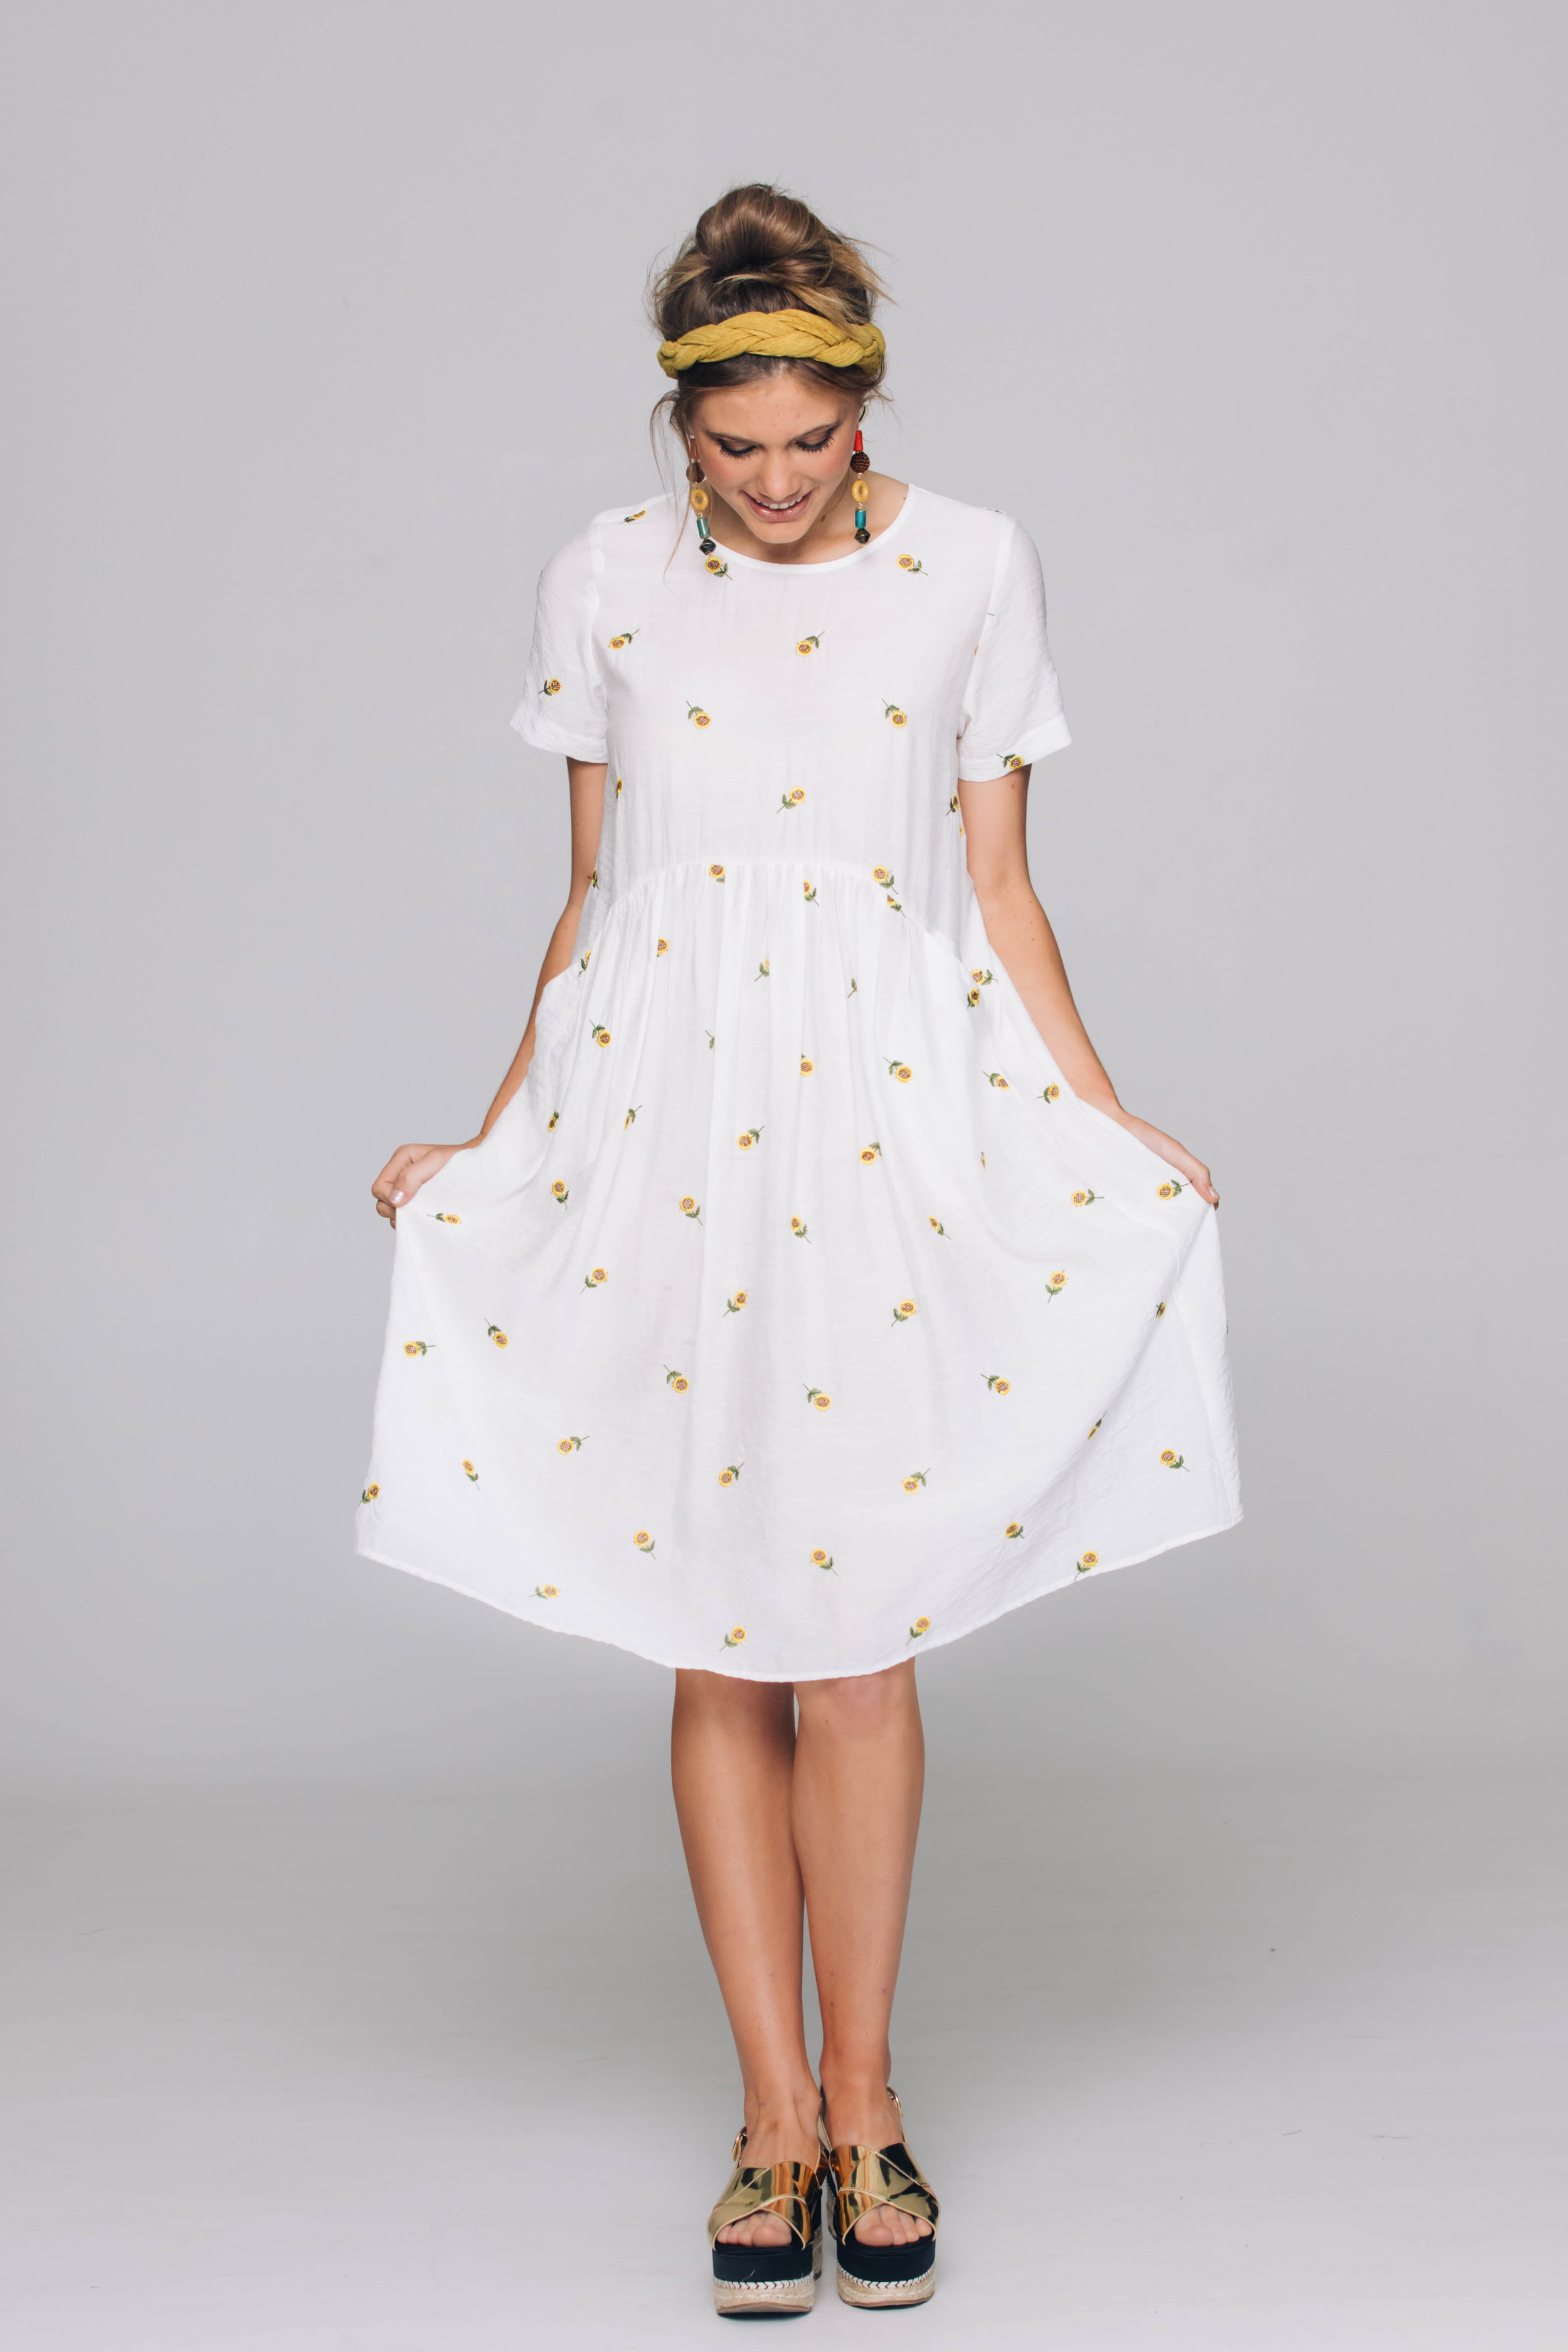 6177T Venice Dress, Suzi Sunflower Ivory